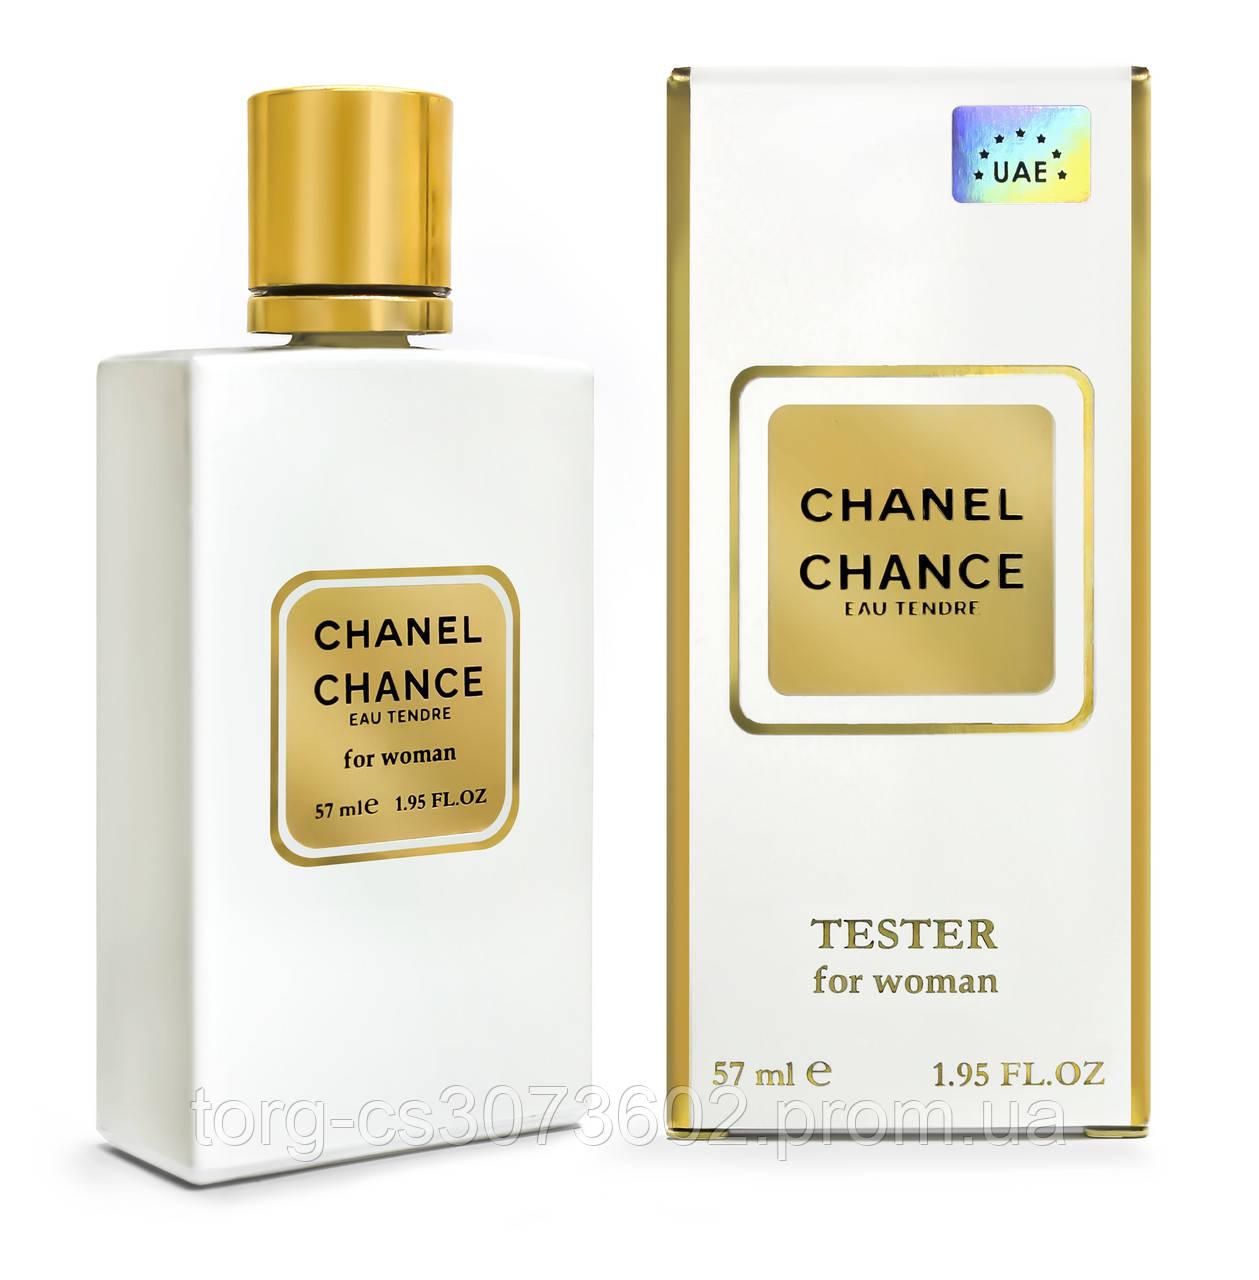 Тестер женский CHANEL Chance Eau Tendre, 57 мл.